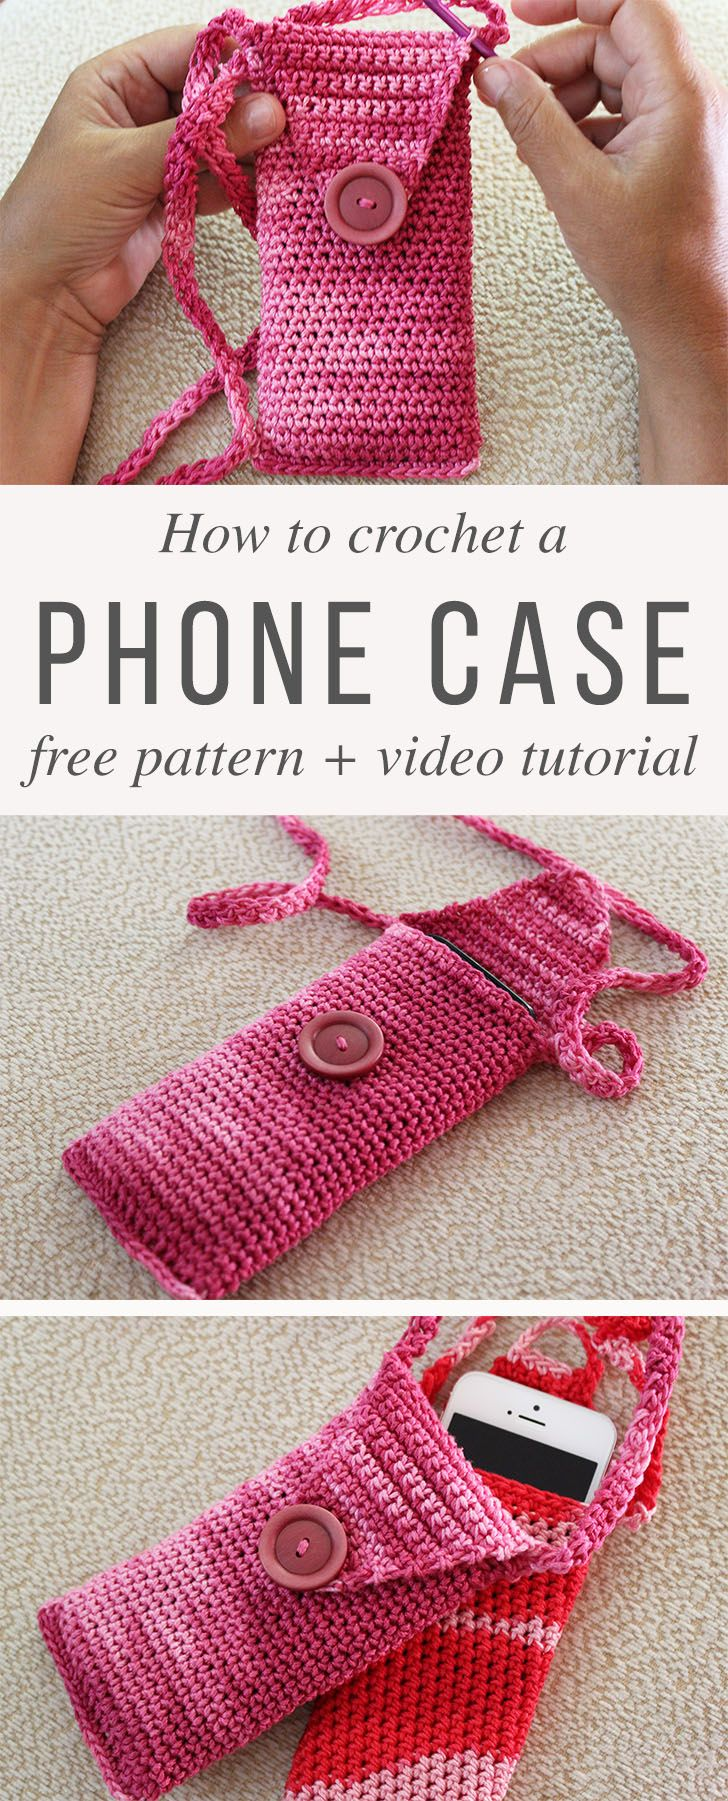 Fancy Phone Case Crochet Free Pattern And Video Tutorial